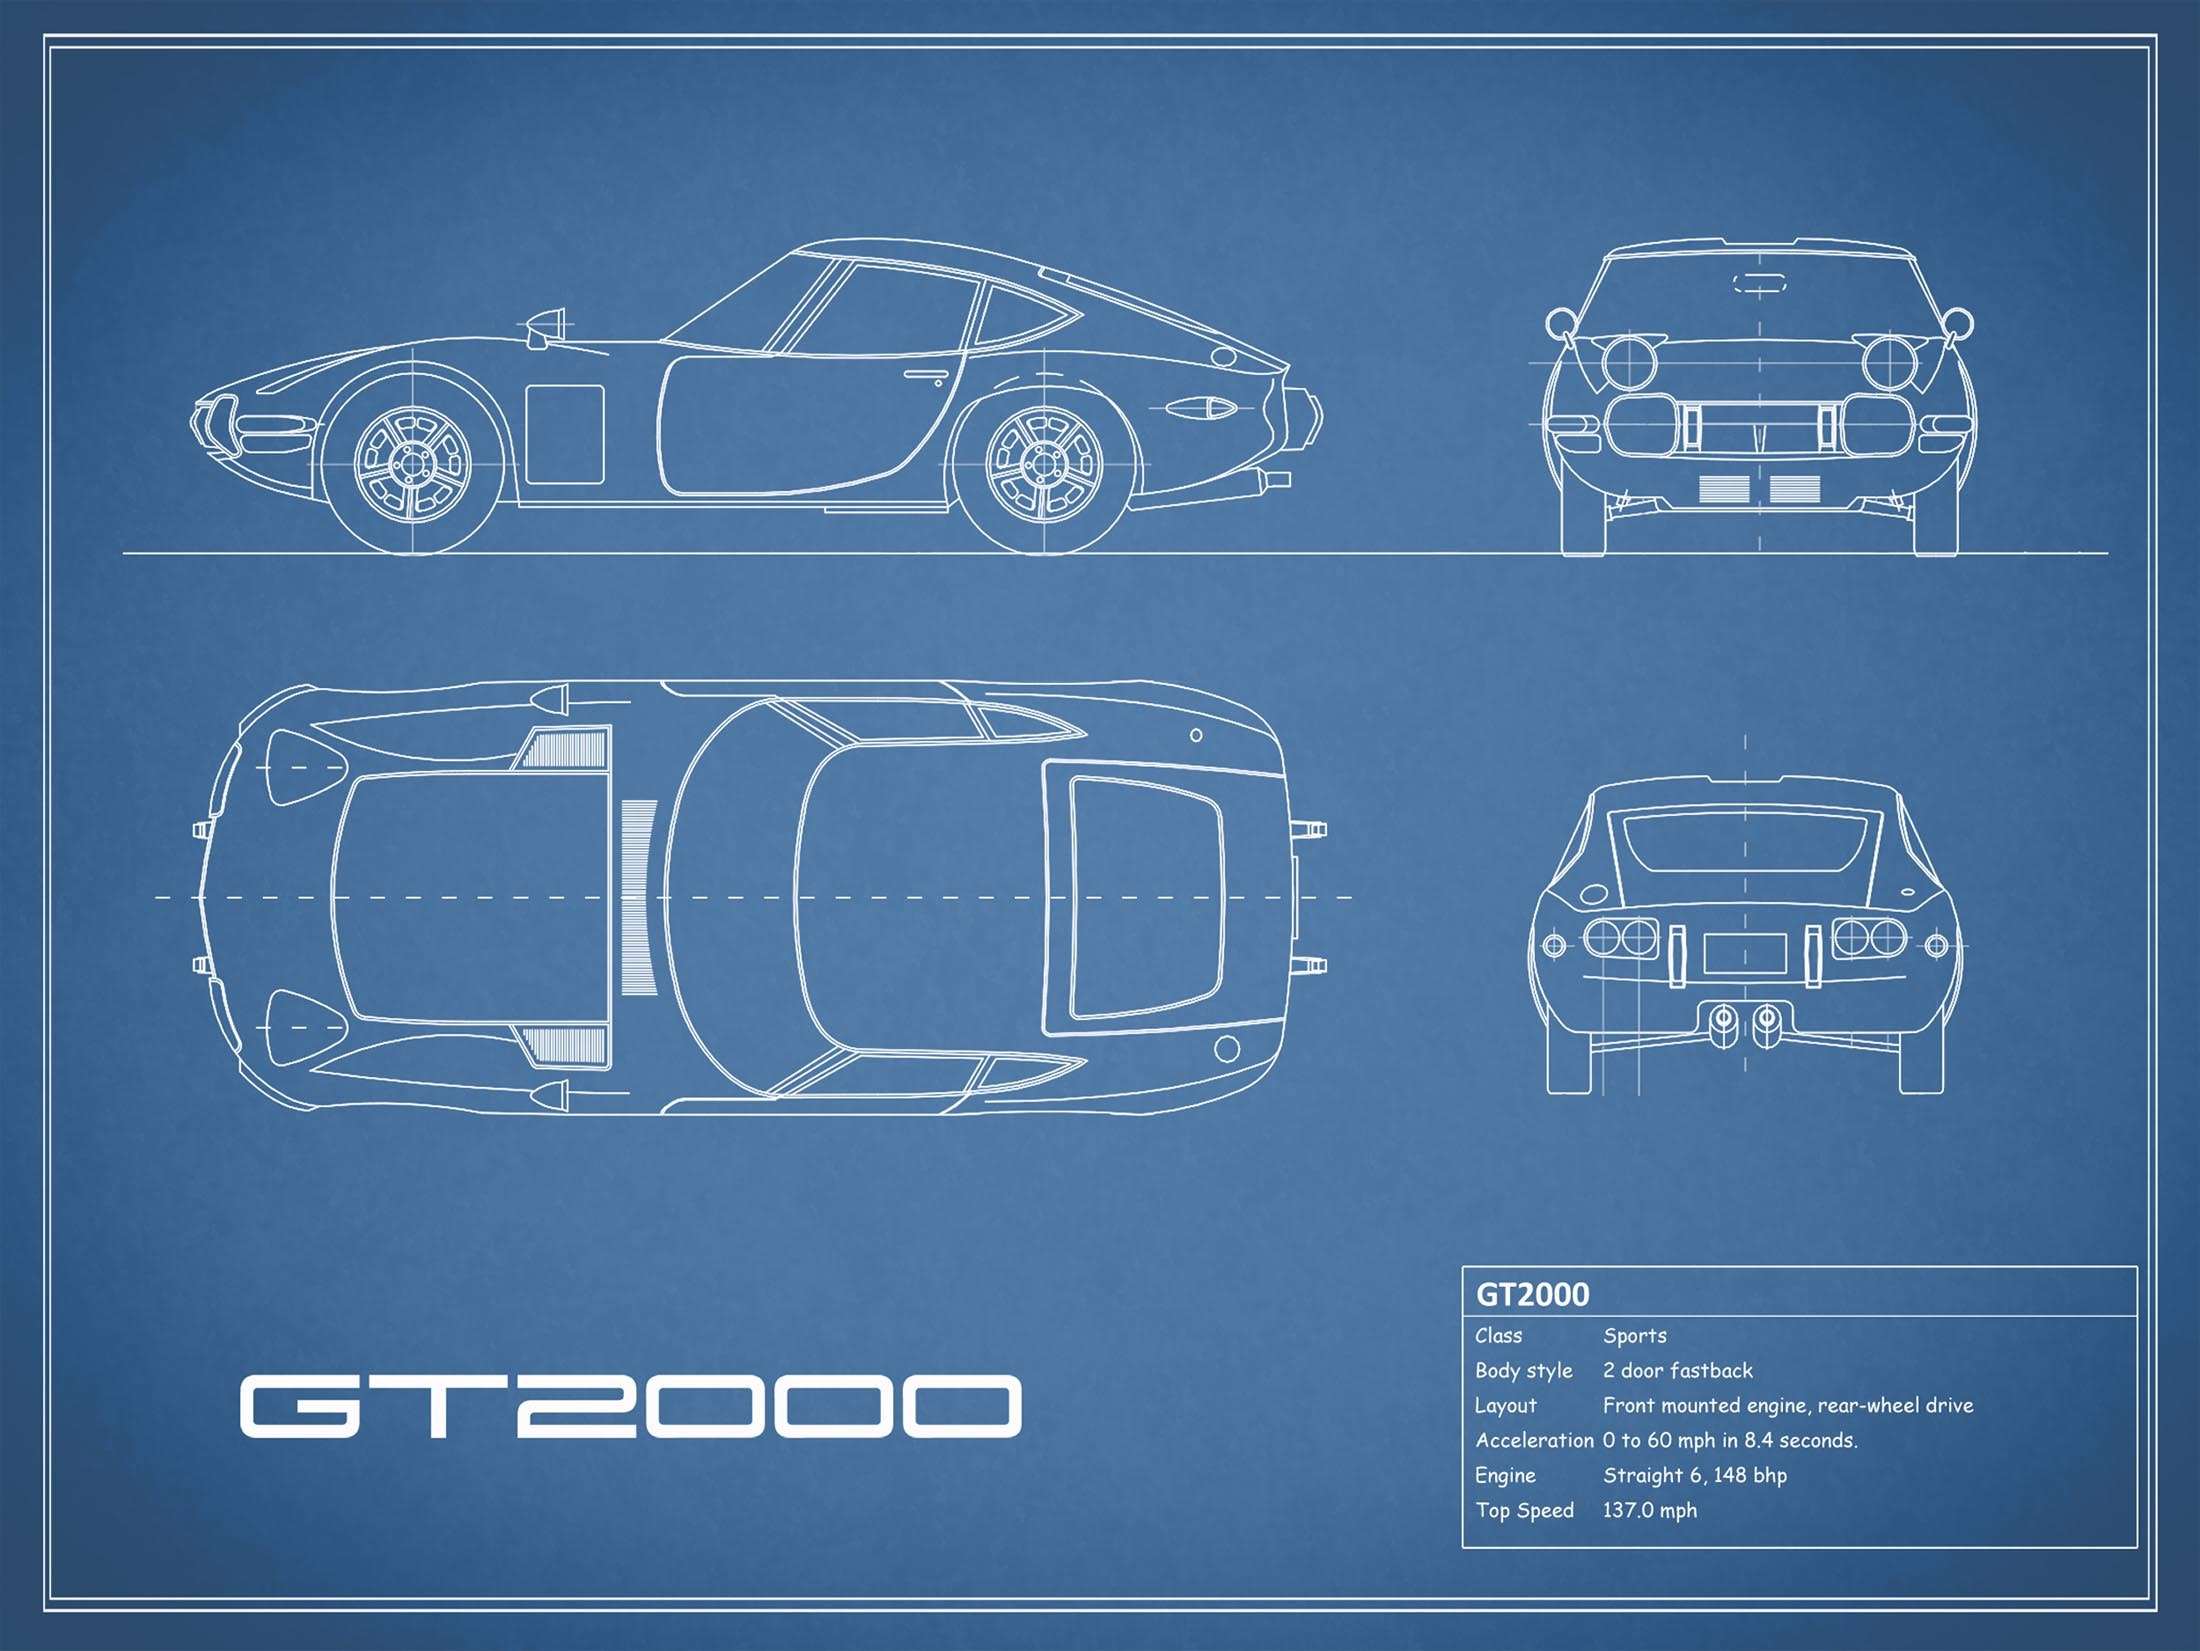 Toyota GT2000 - Blue